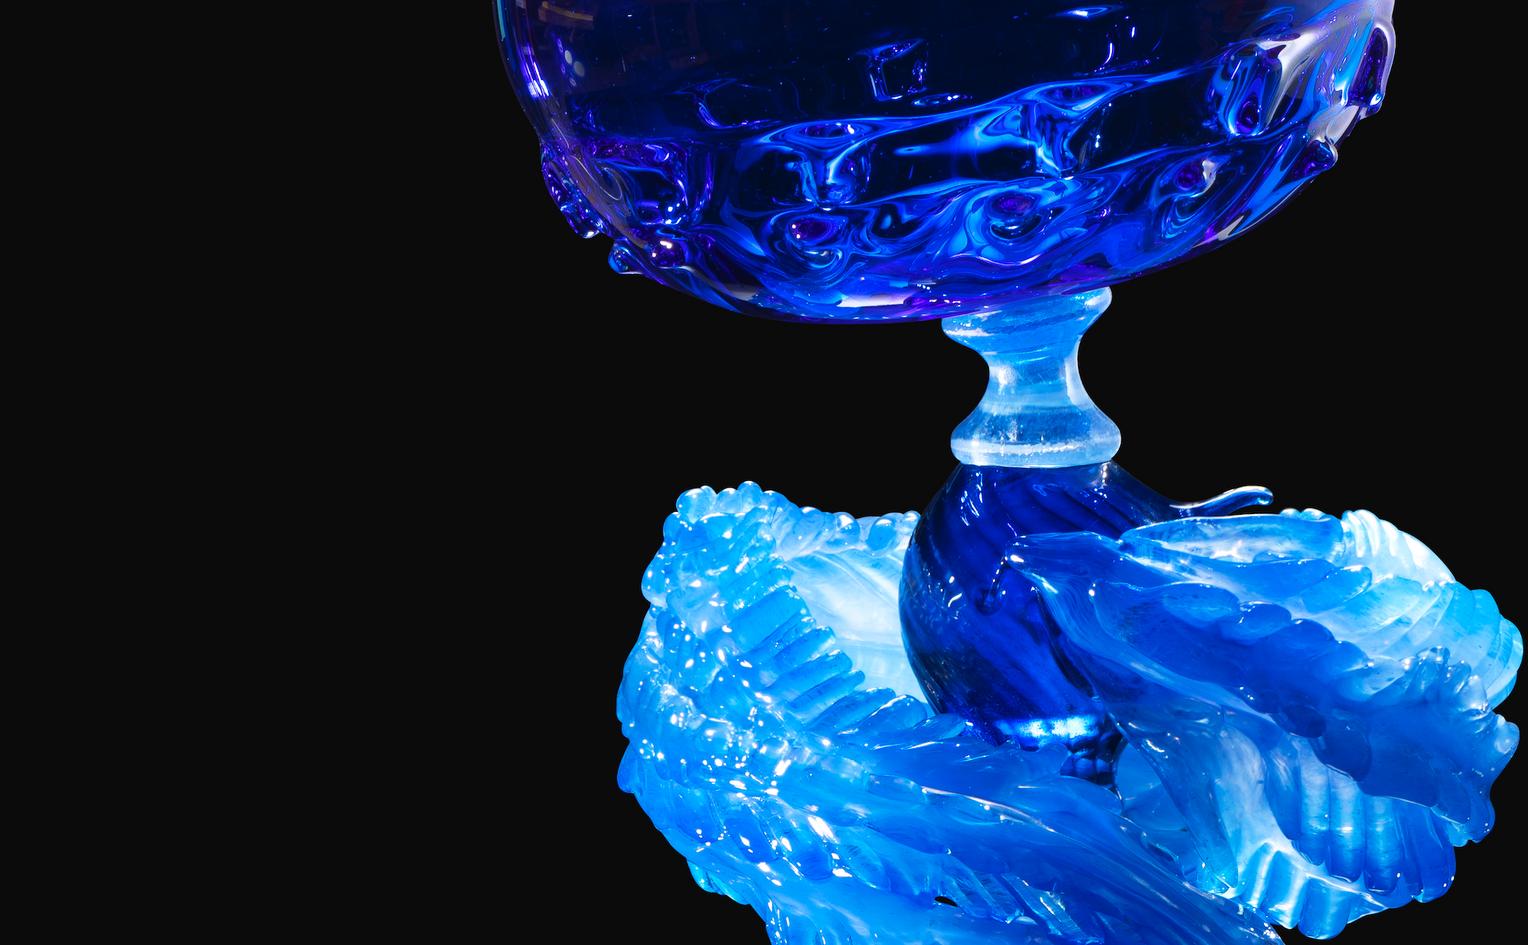 Detail of glass sculpture by Kazuki Takizawa